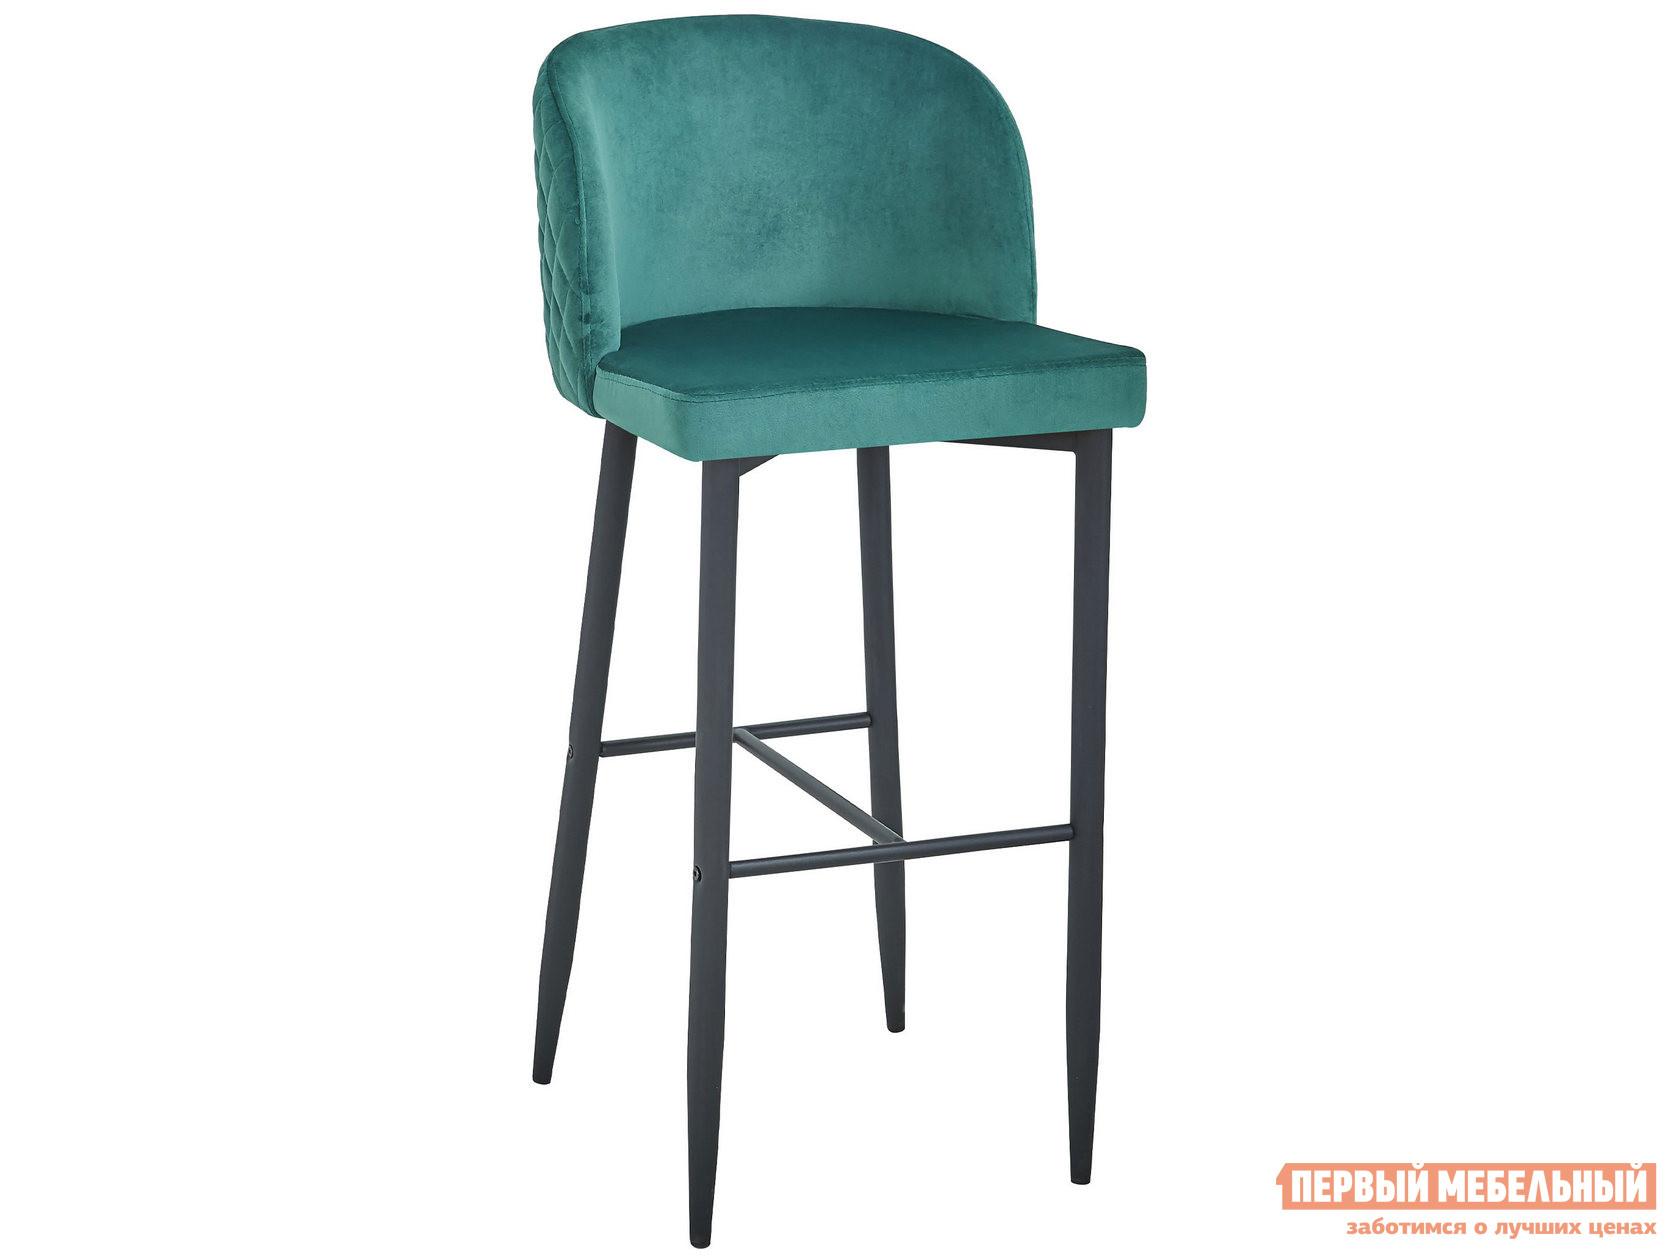 Барный стул  MC11B HLR-56 Изумрудный, велюр Stool Group 105045